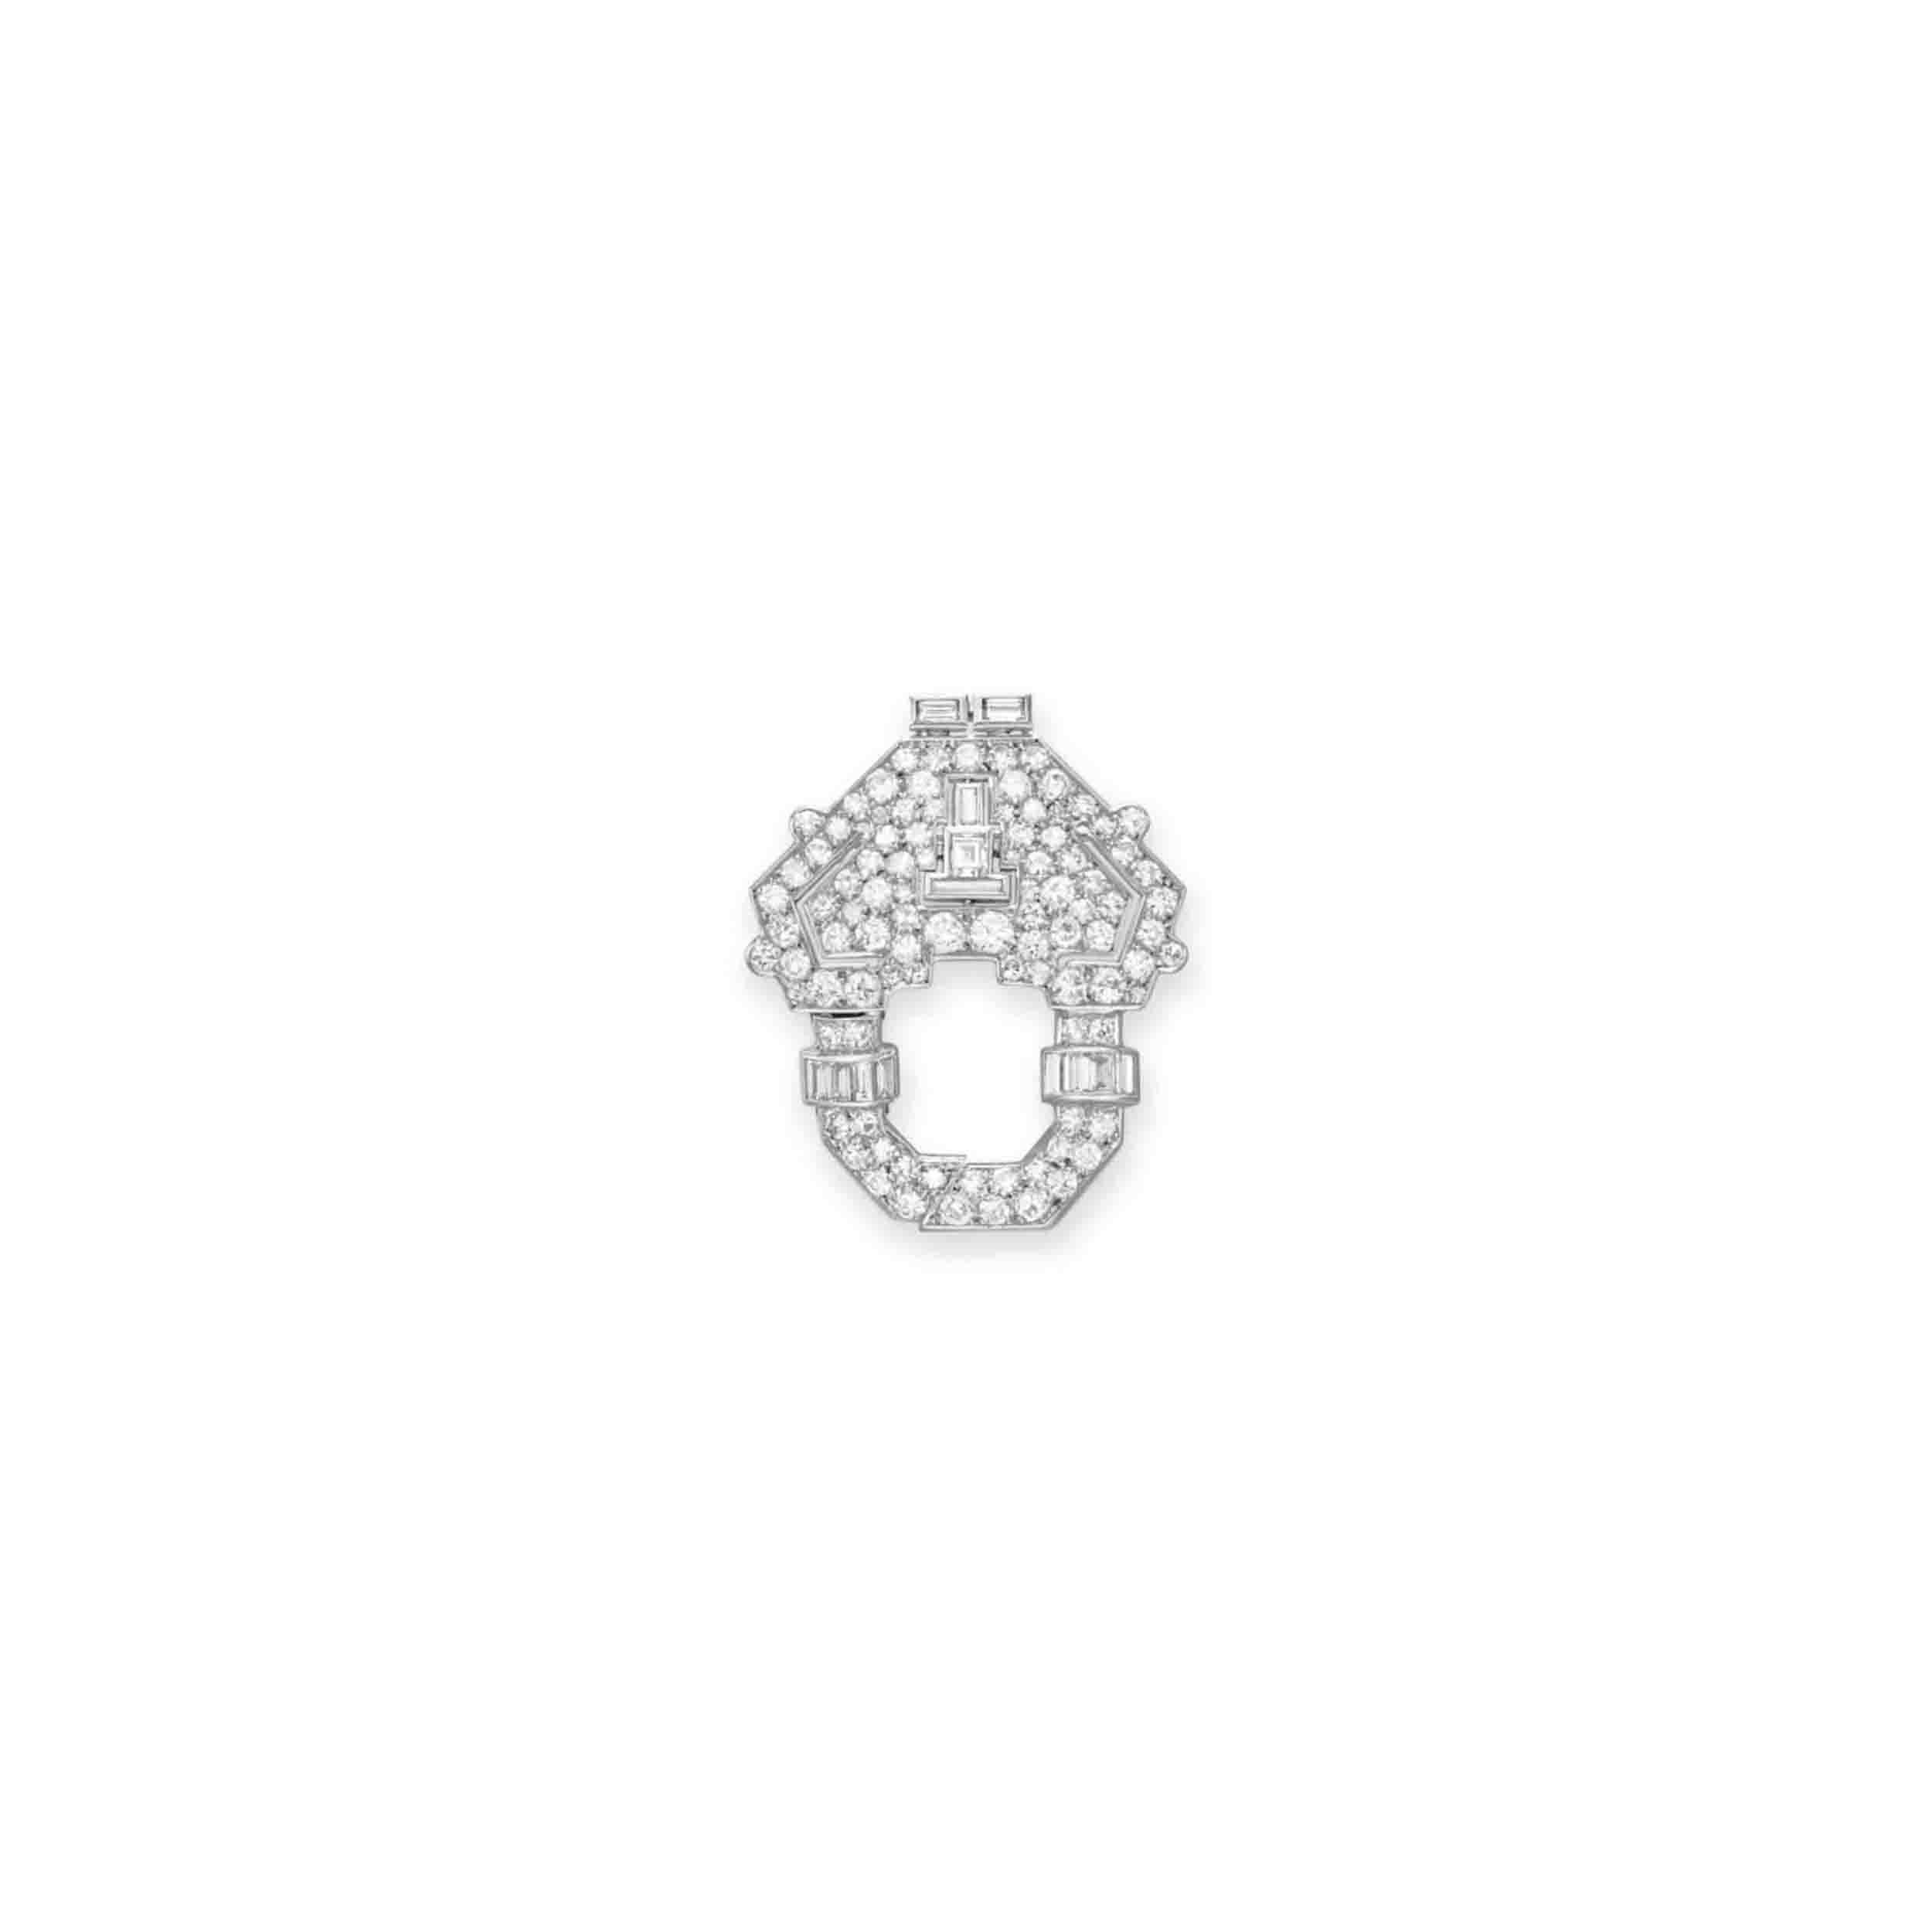 AN ART DECO DIAMOND BROOCH, BY GHISO